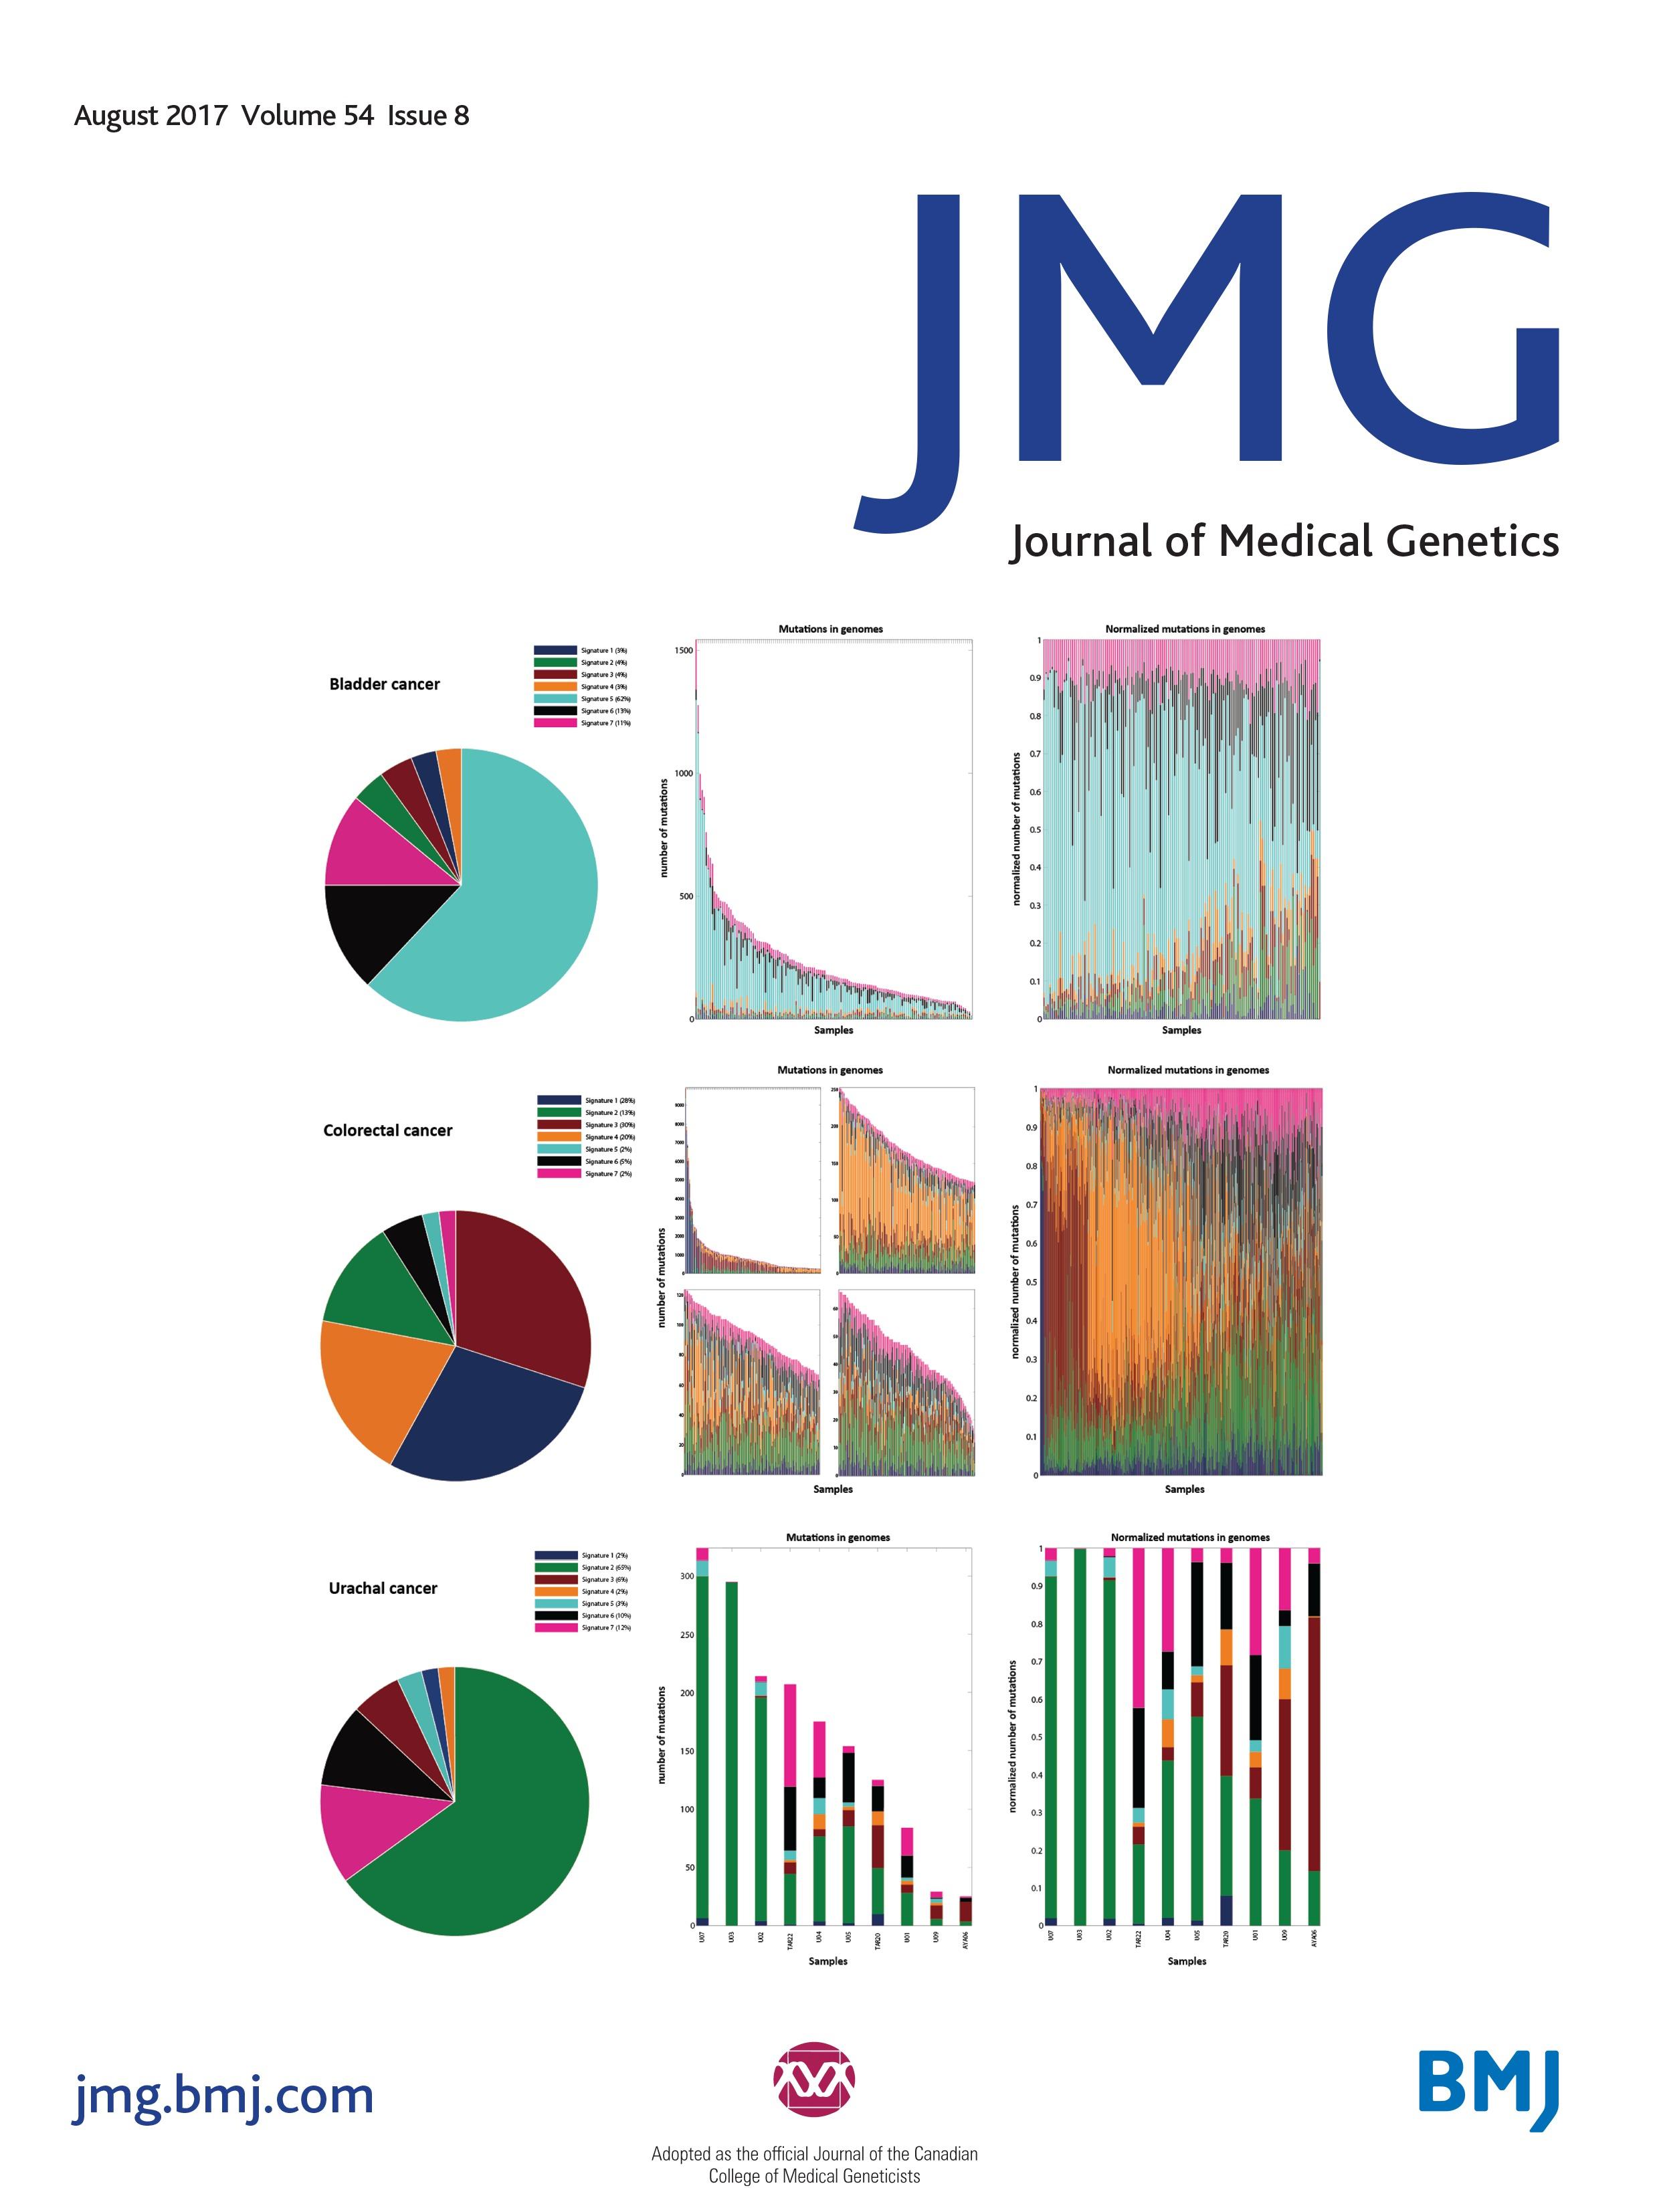 Genetics implicate mon mechanisms in autism and schizophrenia